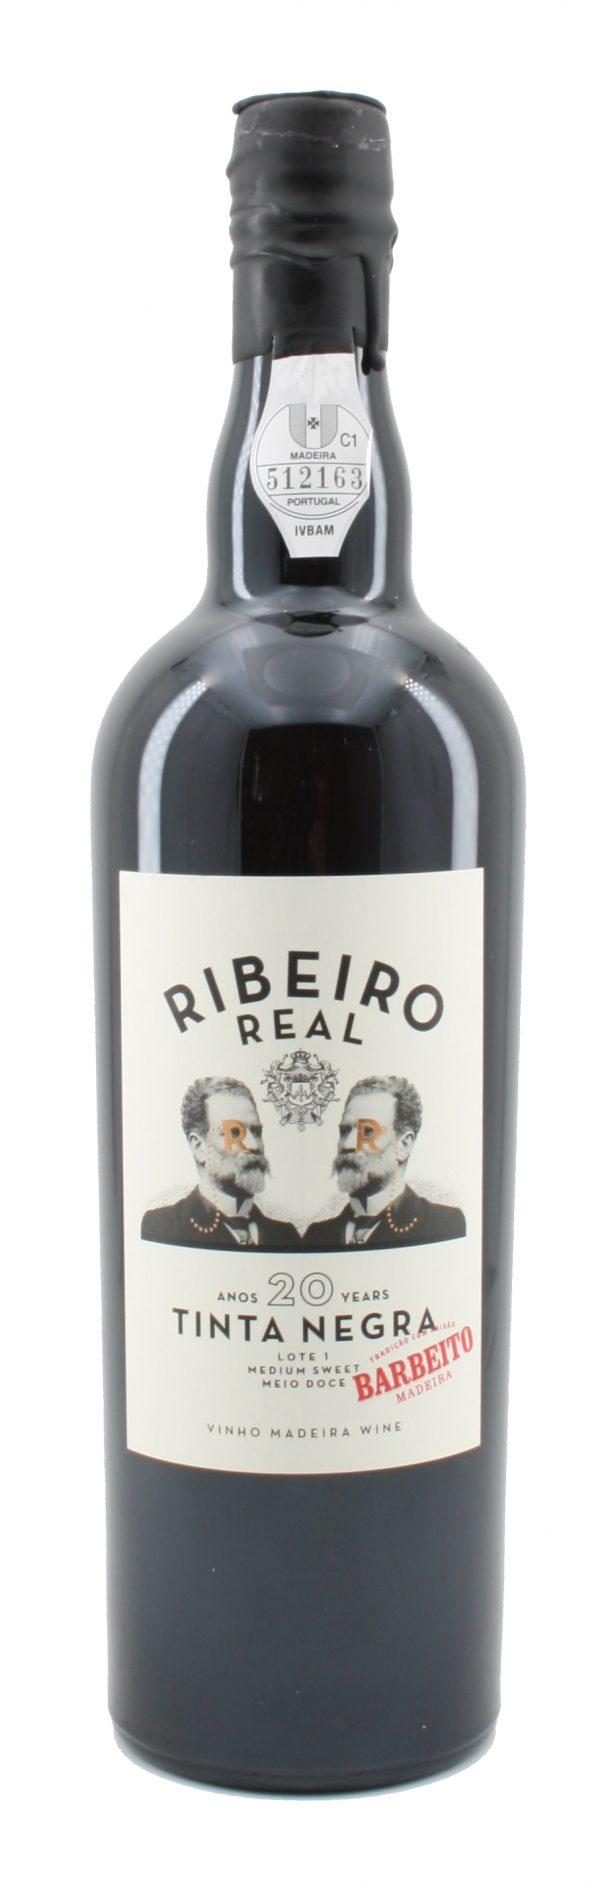 Ribeiro Real Tinta Negra Medium Sweet Madeira 20 Jahre alt